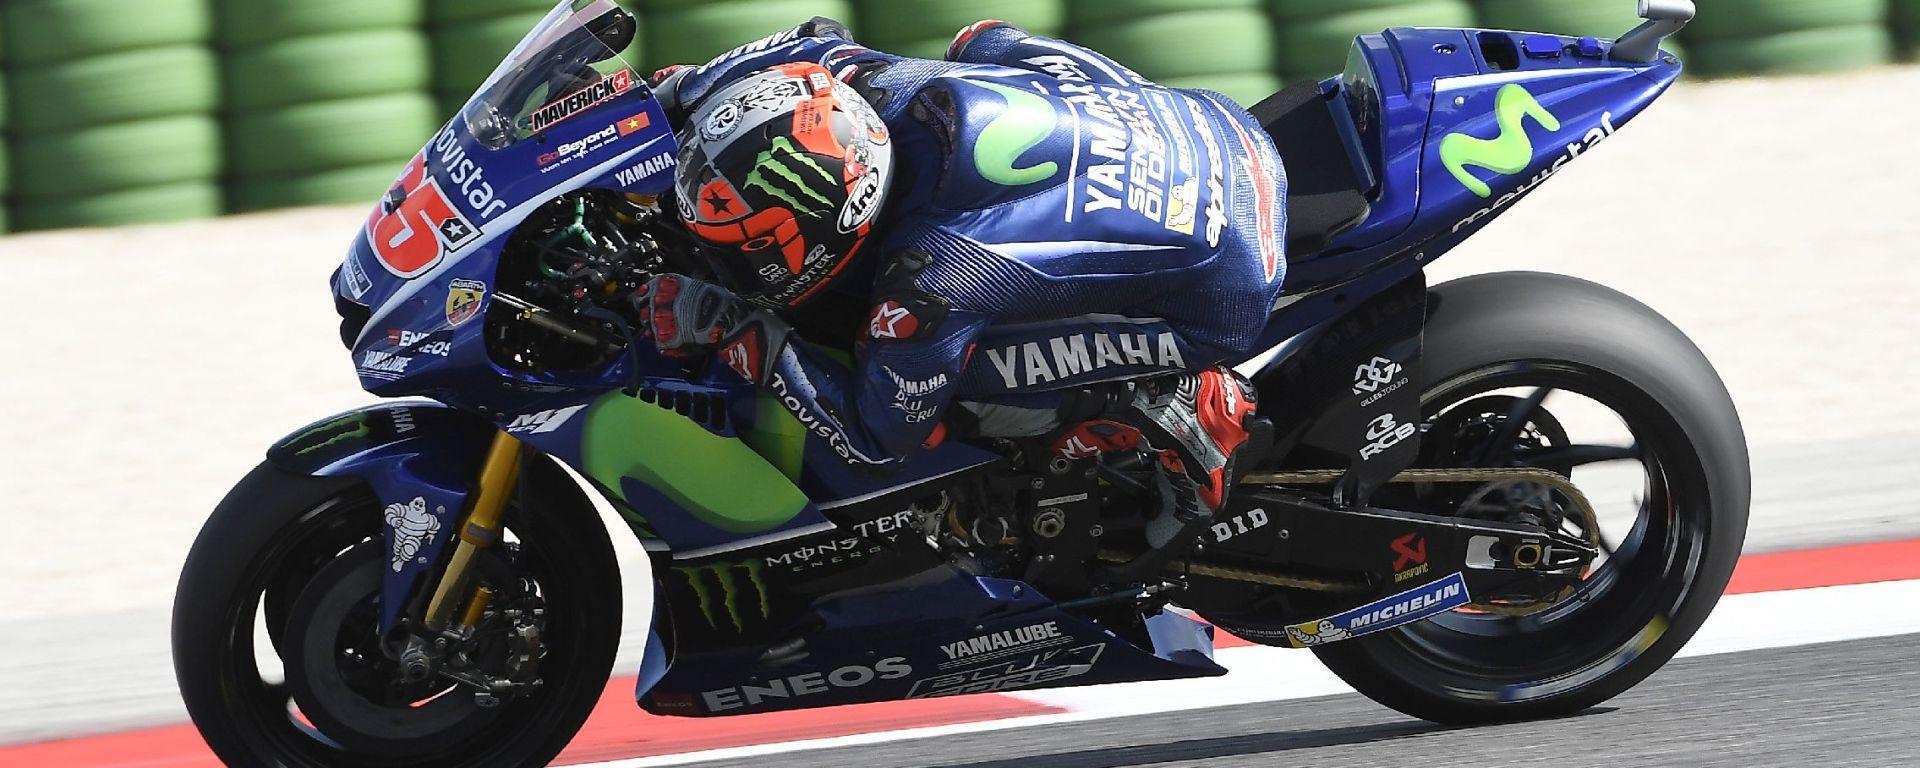 MotoGP Misano 2017, Maverick Vinales